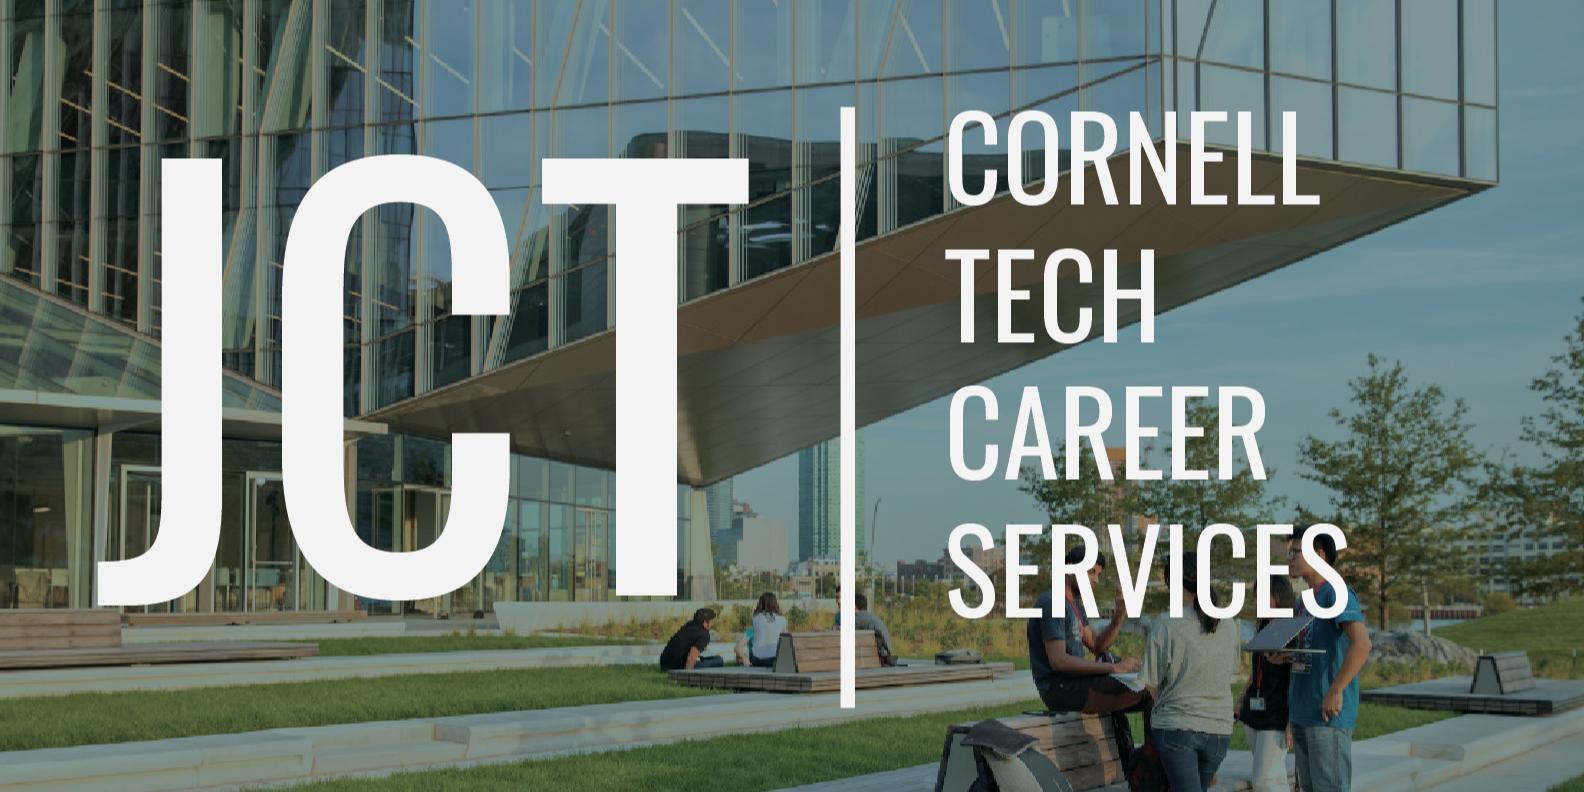 Cornell Tech Student Services: Student Hangout